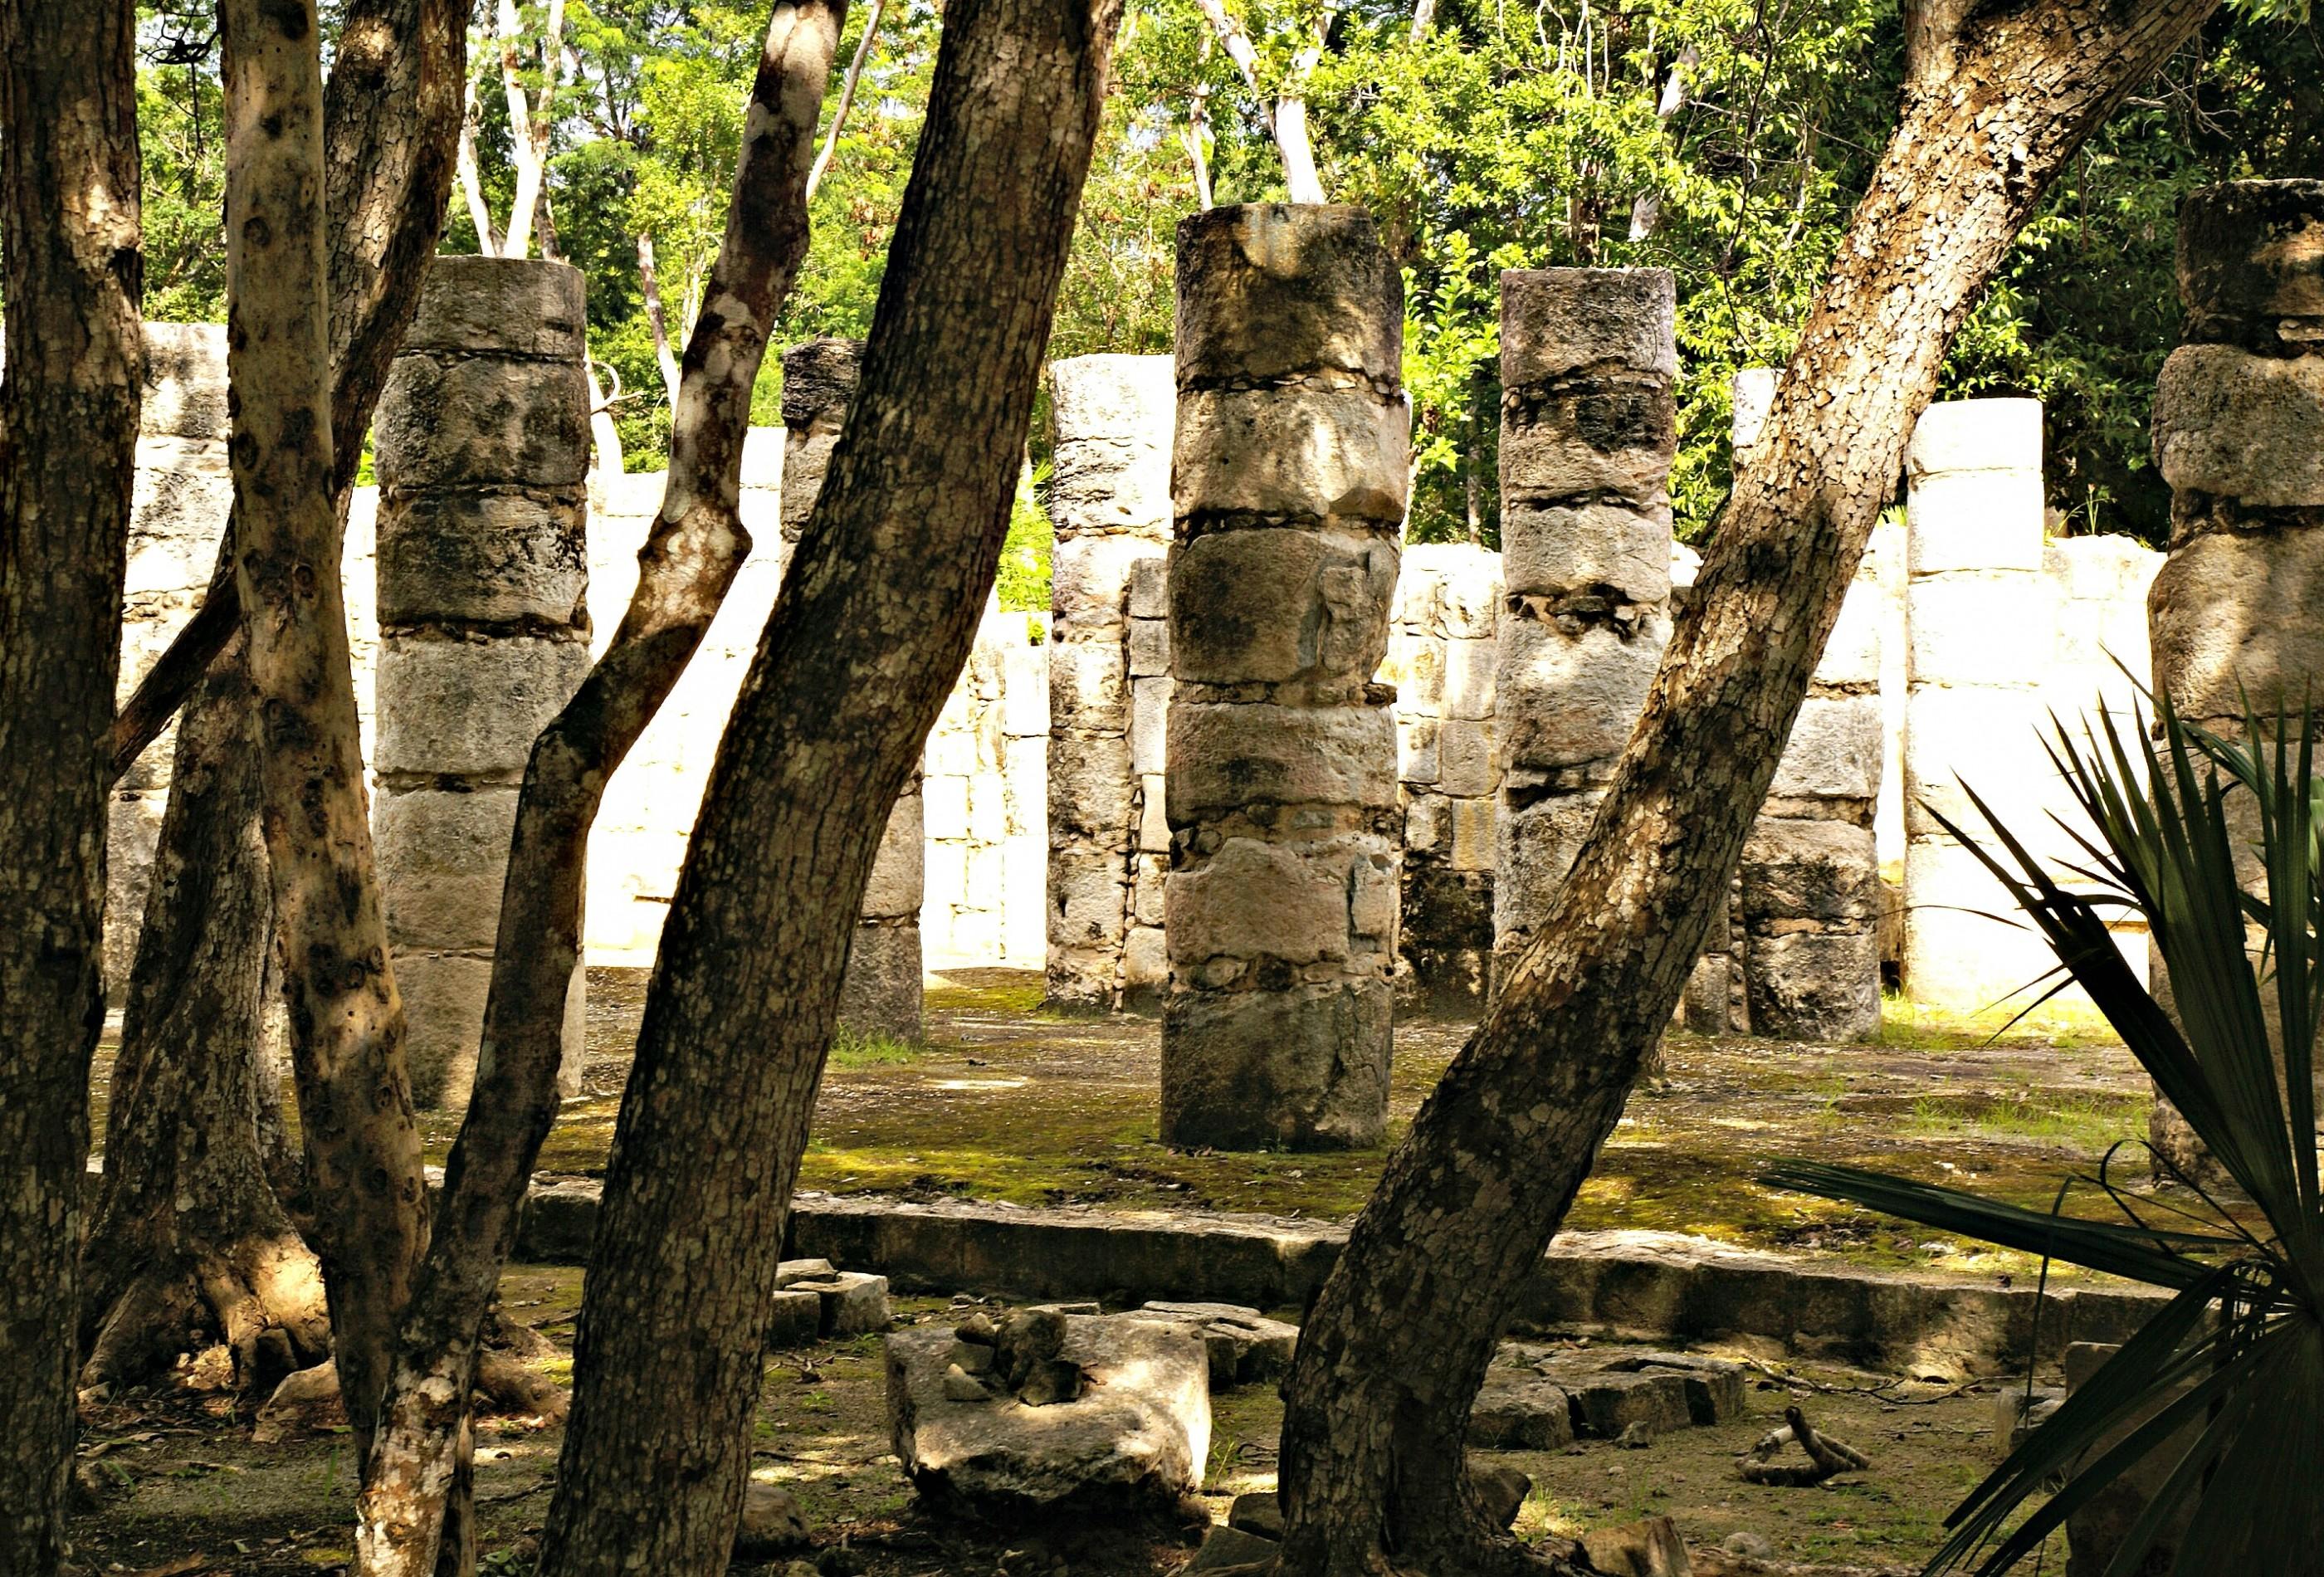 Ruins mixt with the jungle. Photo by Ovidiu Balaj